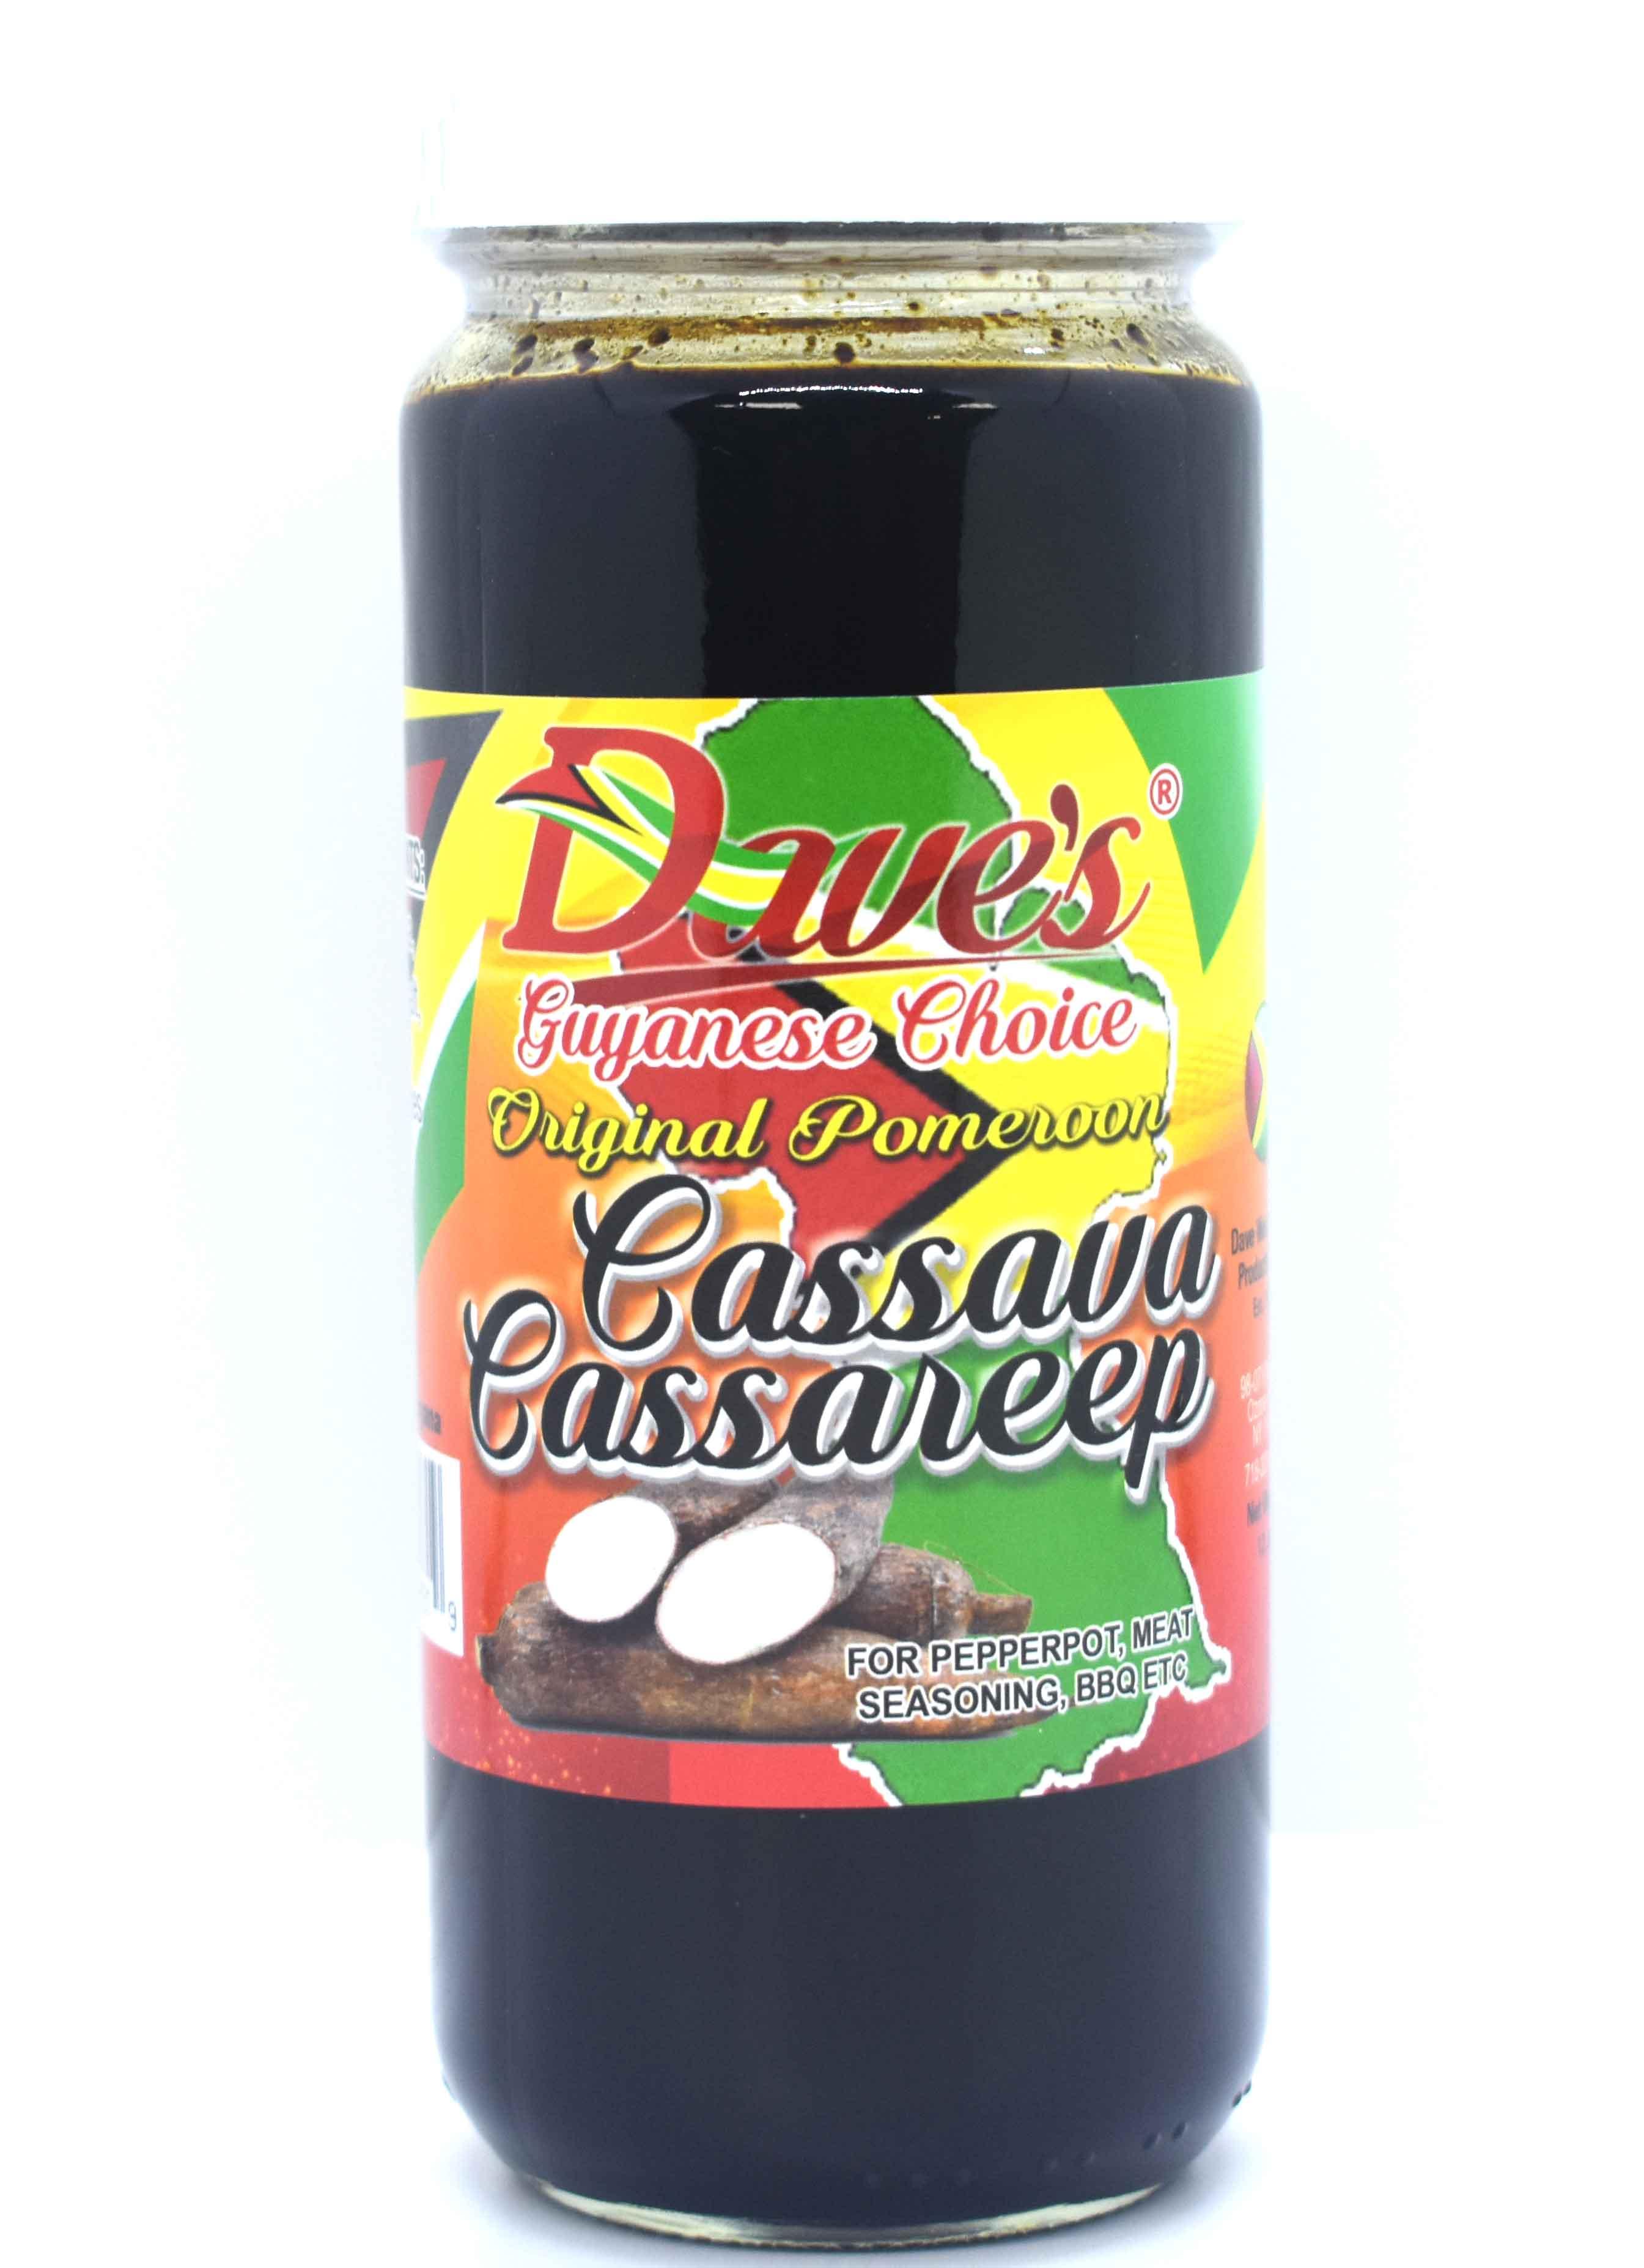 Dave's Guyanese Choice Cassava Cassareep 12oz